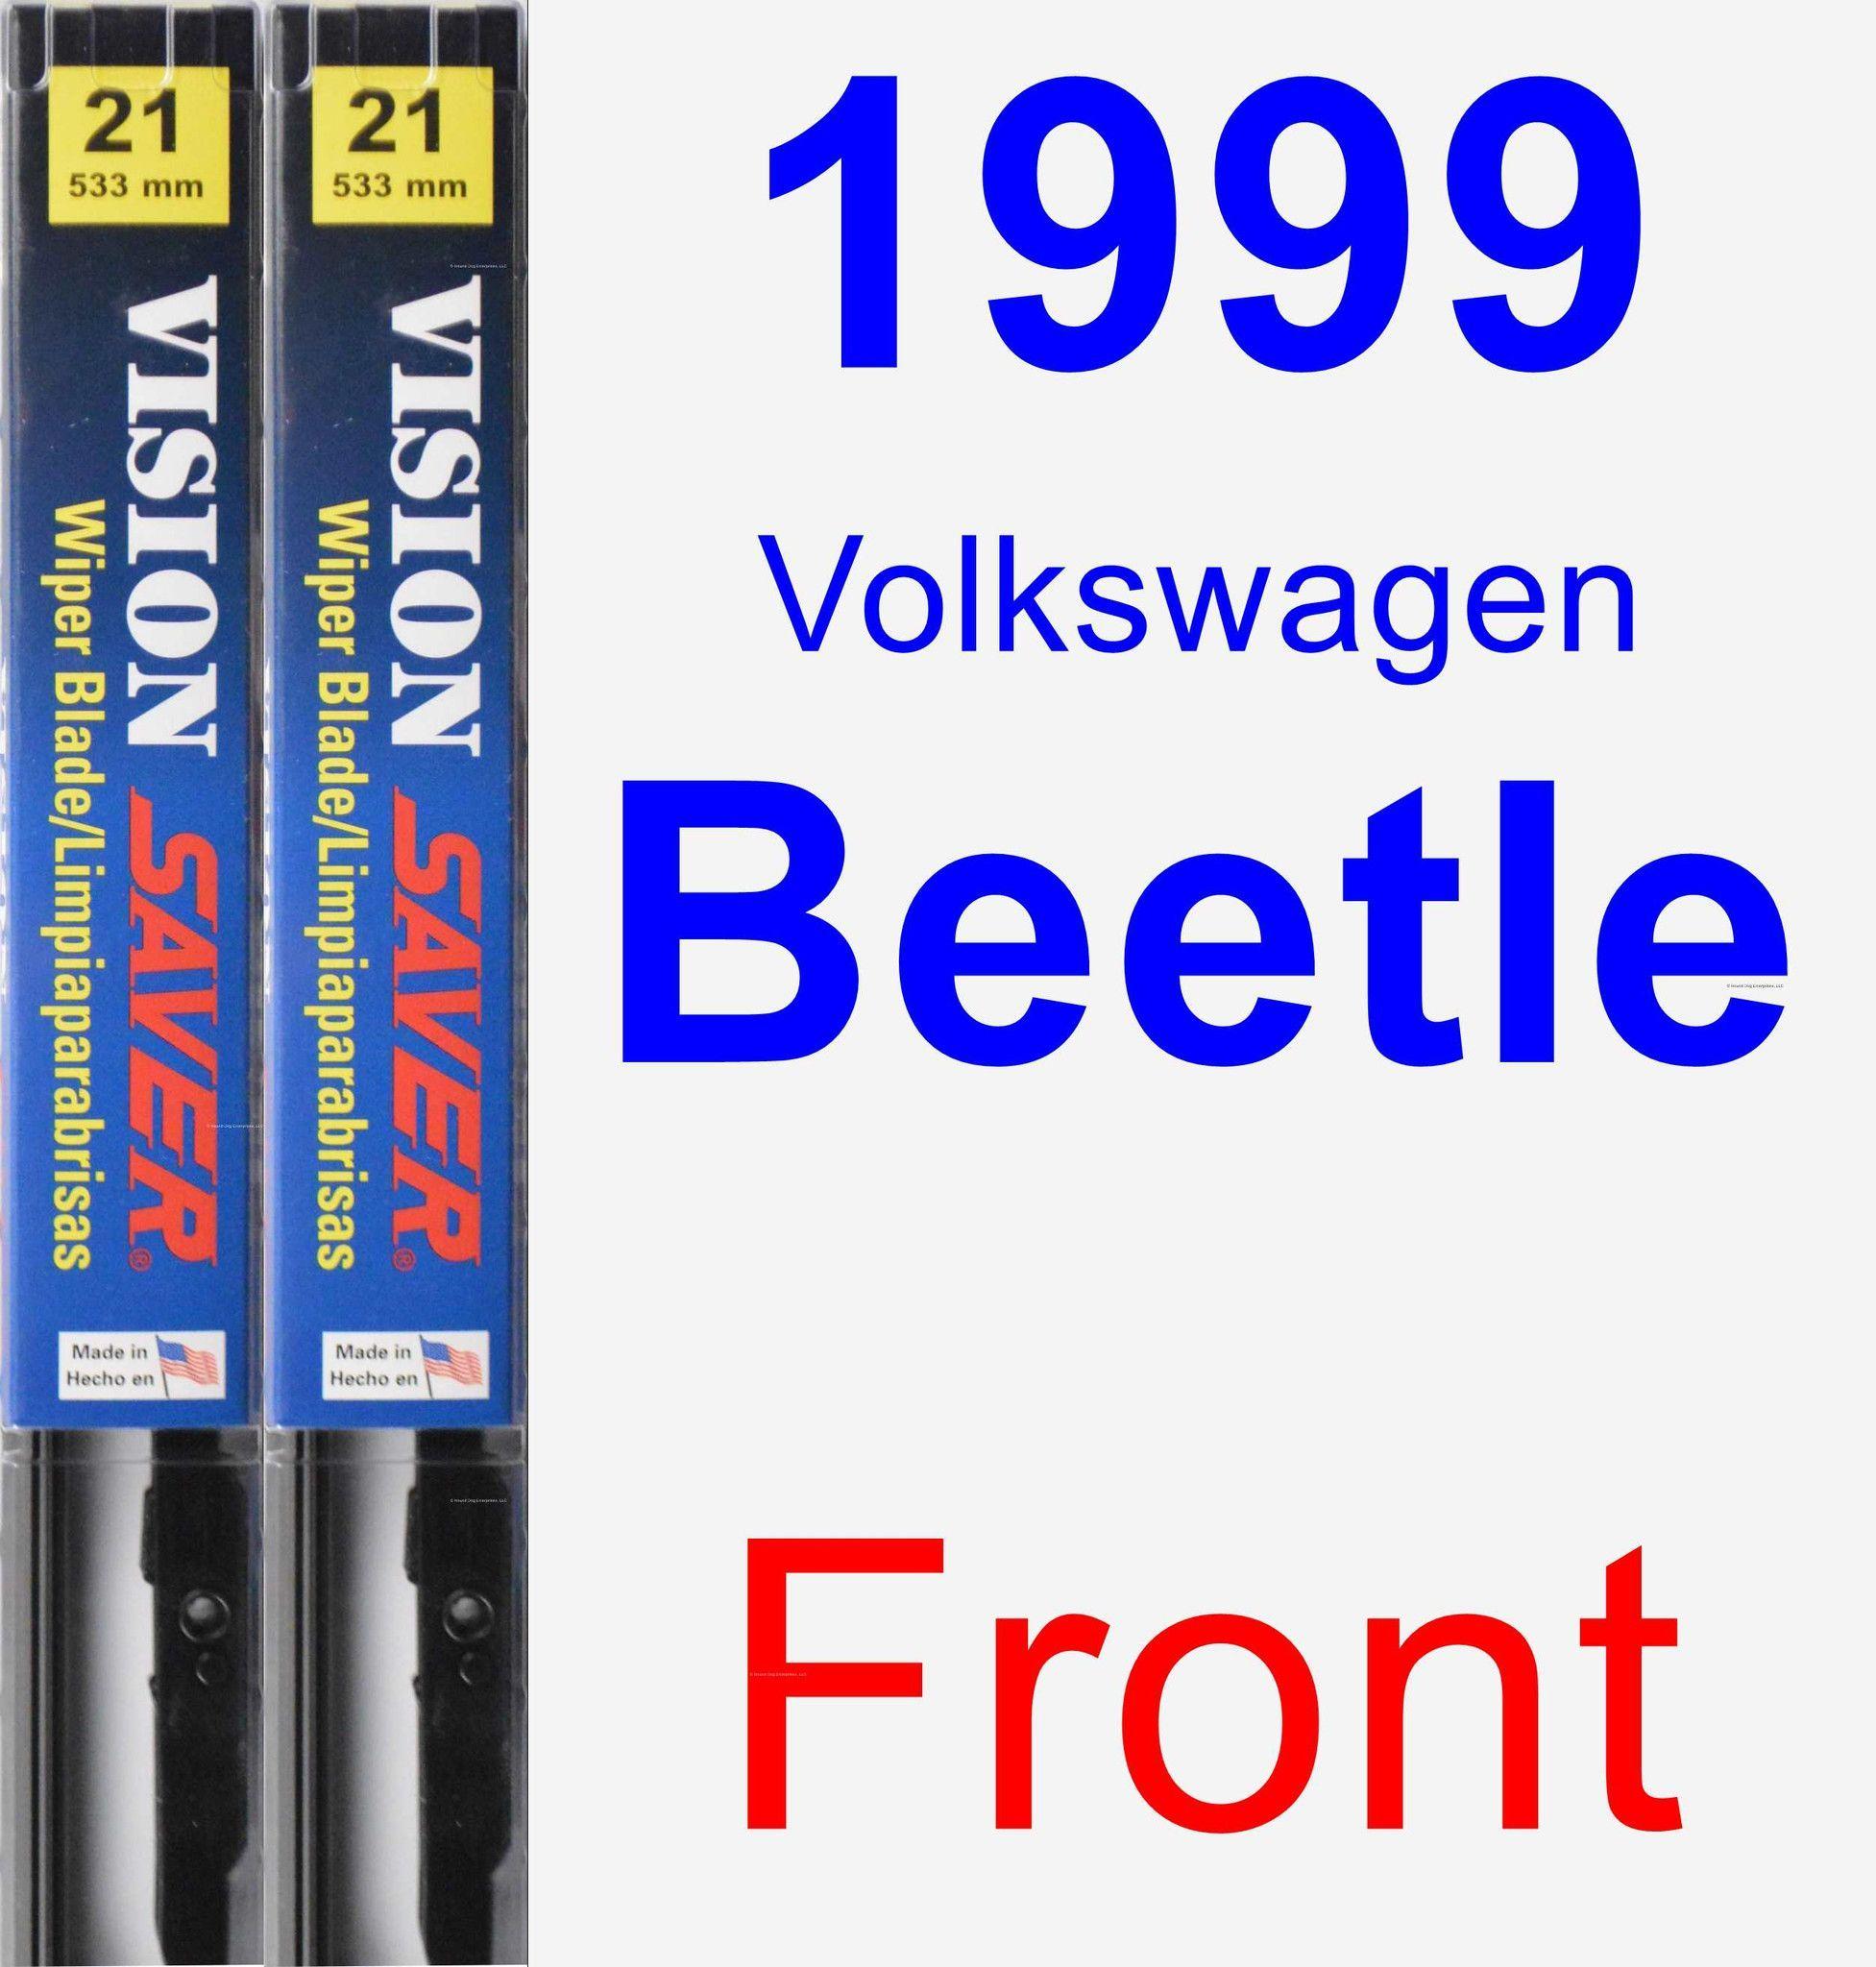 Front Wiper Blade Pack for 1999 Volkswagen Beetle - Vision Saver